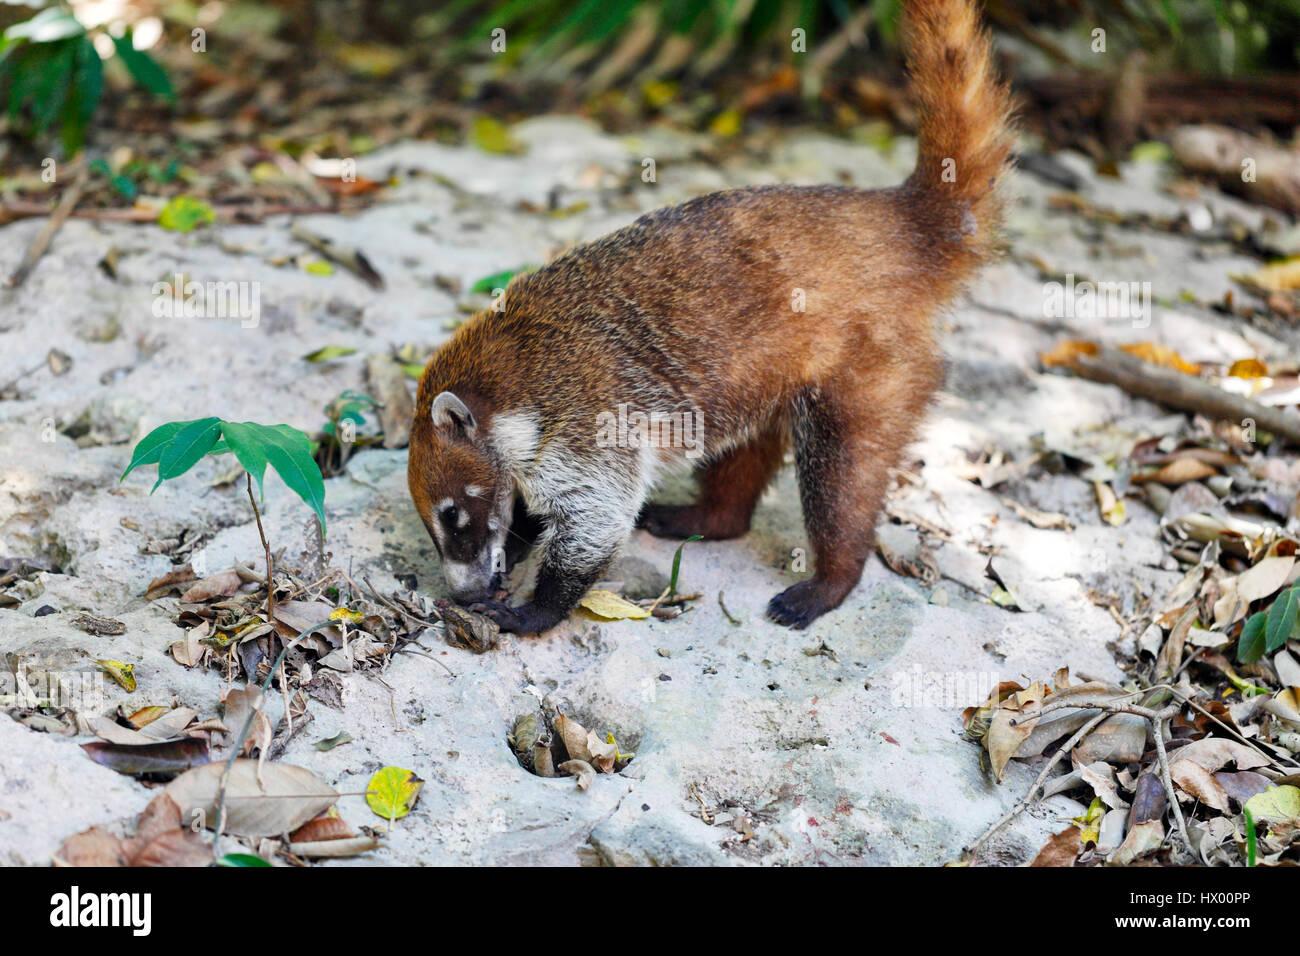 Coatí de cerca animales en Tulum, México Imagen De Stock